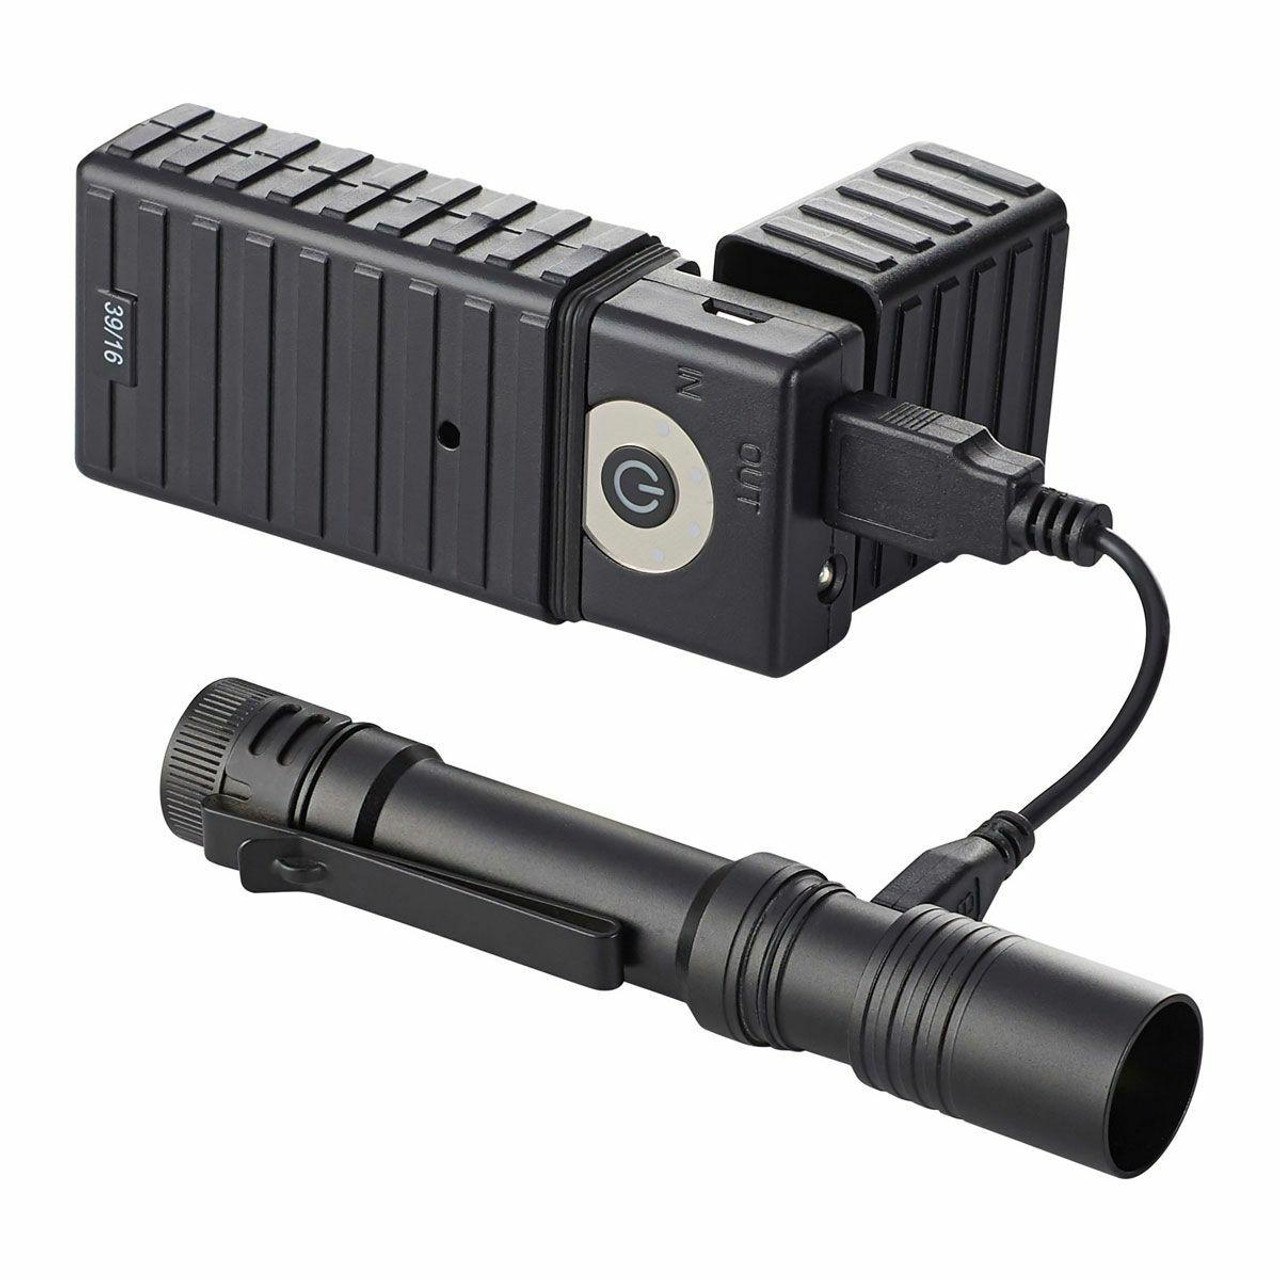 Streamlight Streamlight MacroStream USB Rechargeable Flashlight LED w/Lithium Ion Battery 080926663206